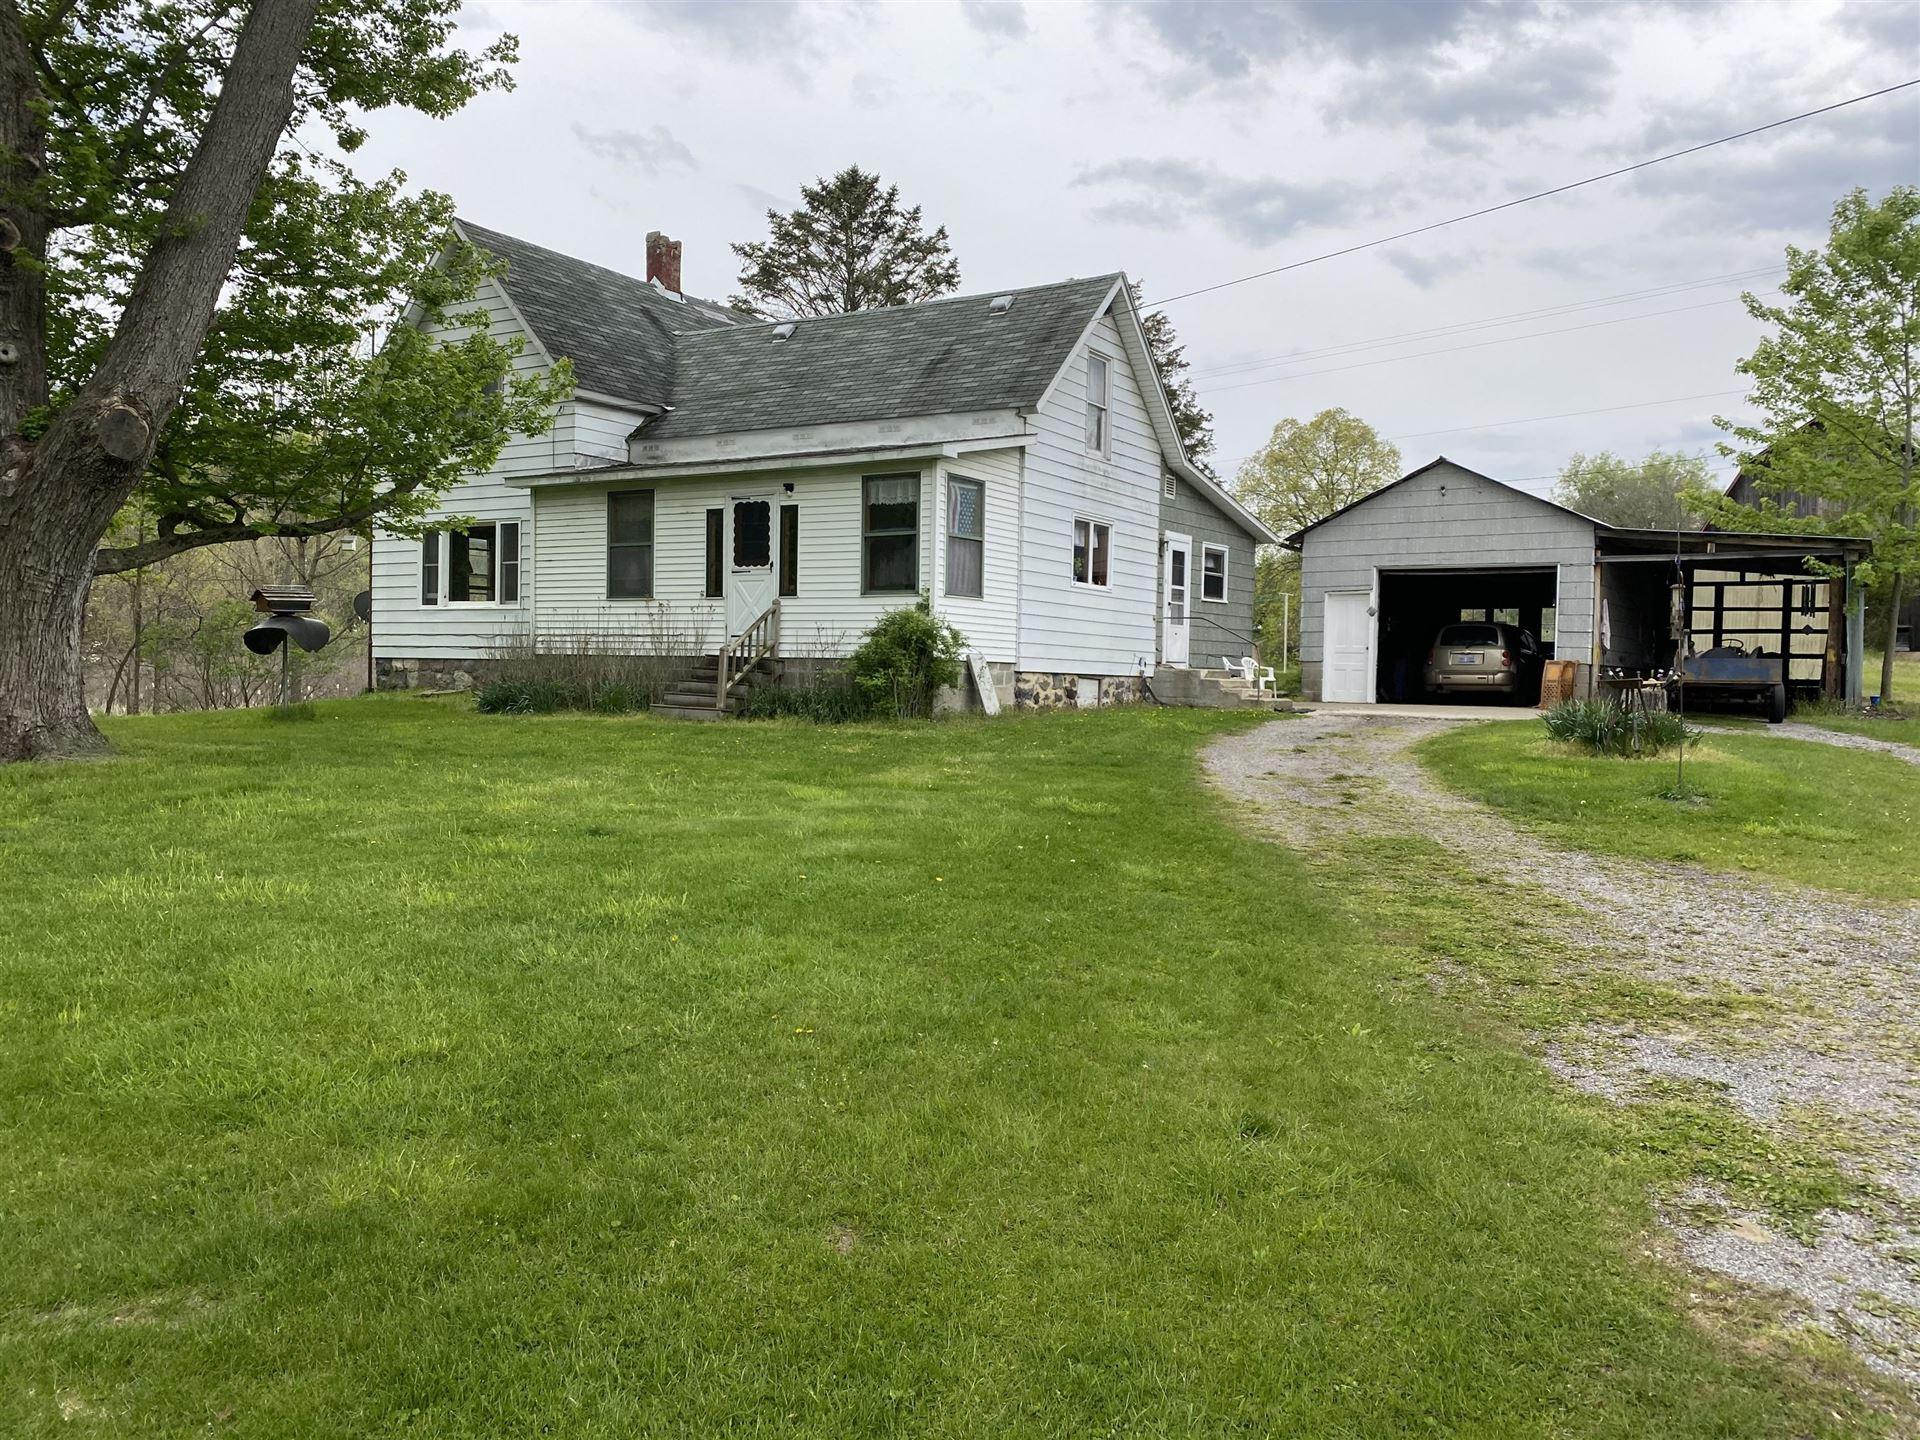 494 Grass Lake Road, Coldwater, MI 49036 - MLS#: 21017442